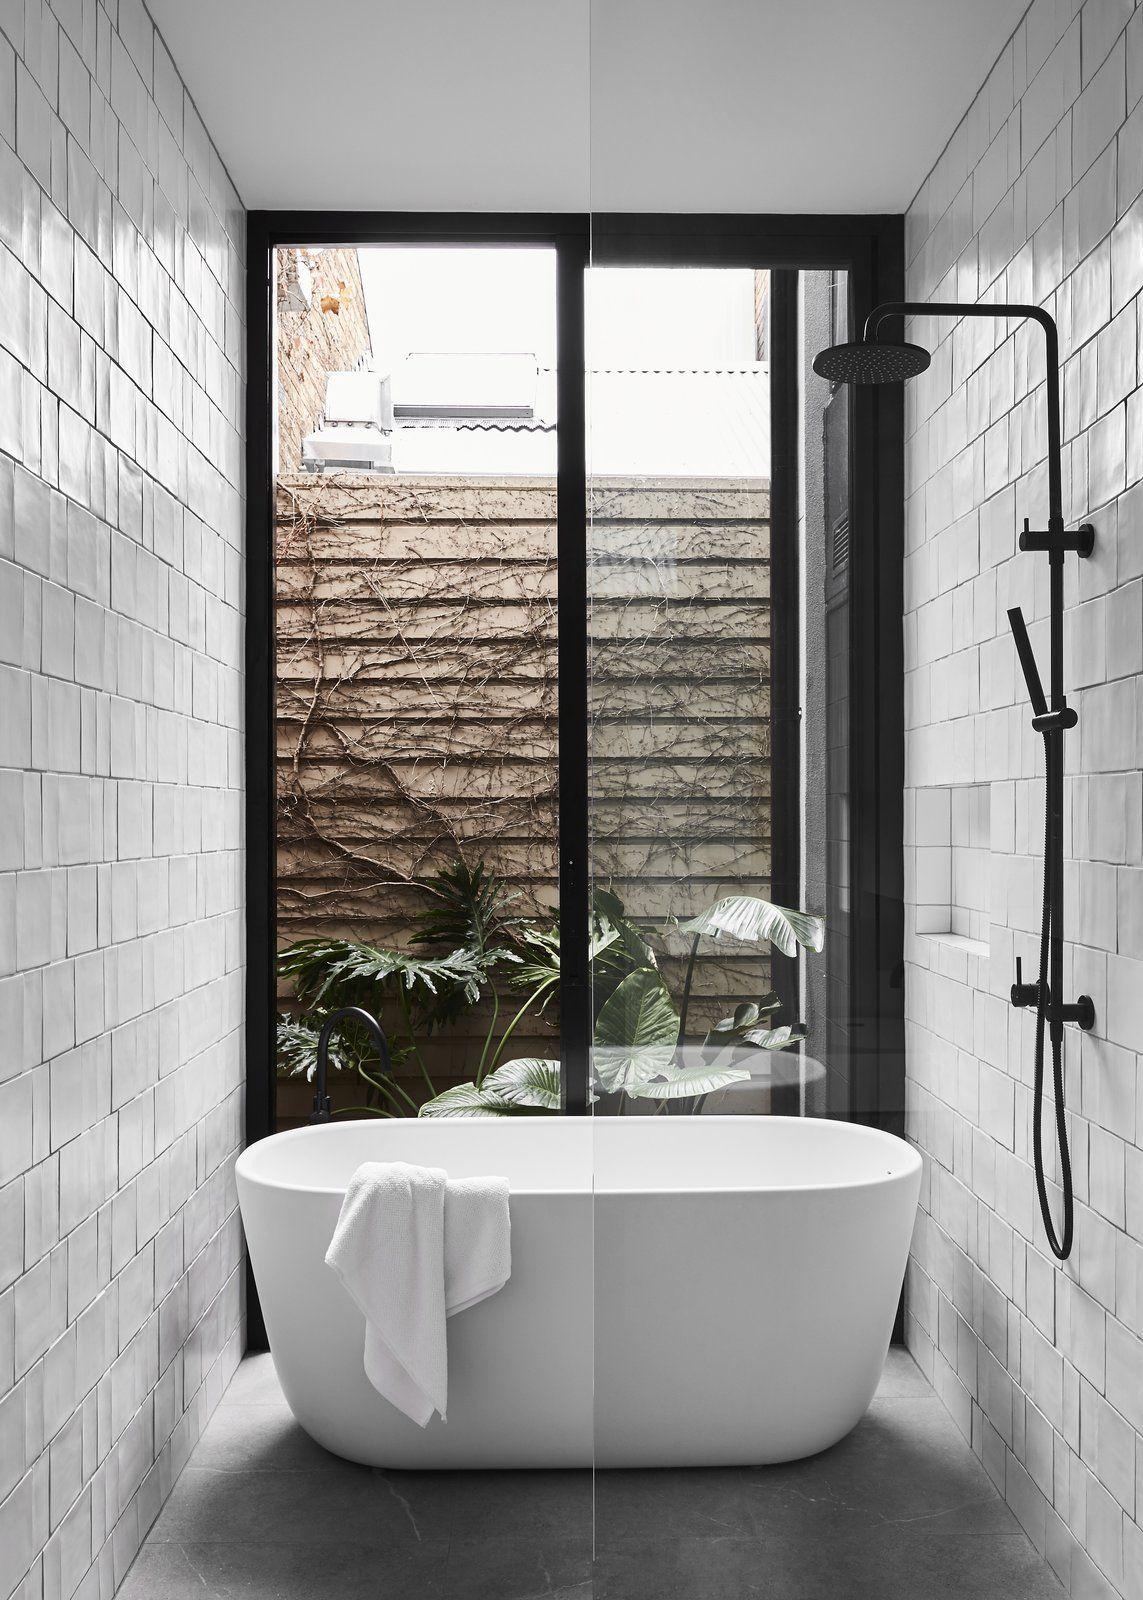 Photo 14 Of 19 In A Historic Melbourne Home Is Respectfully Bathroom Freestanding Modern Bathroom Design Bathroom Interior Design